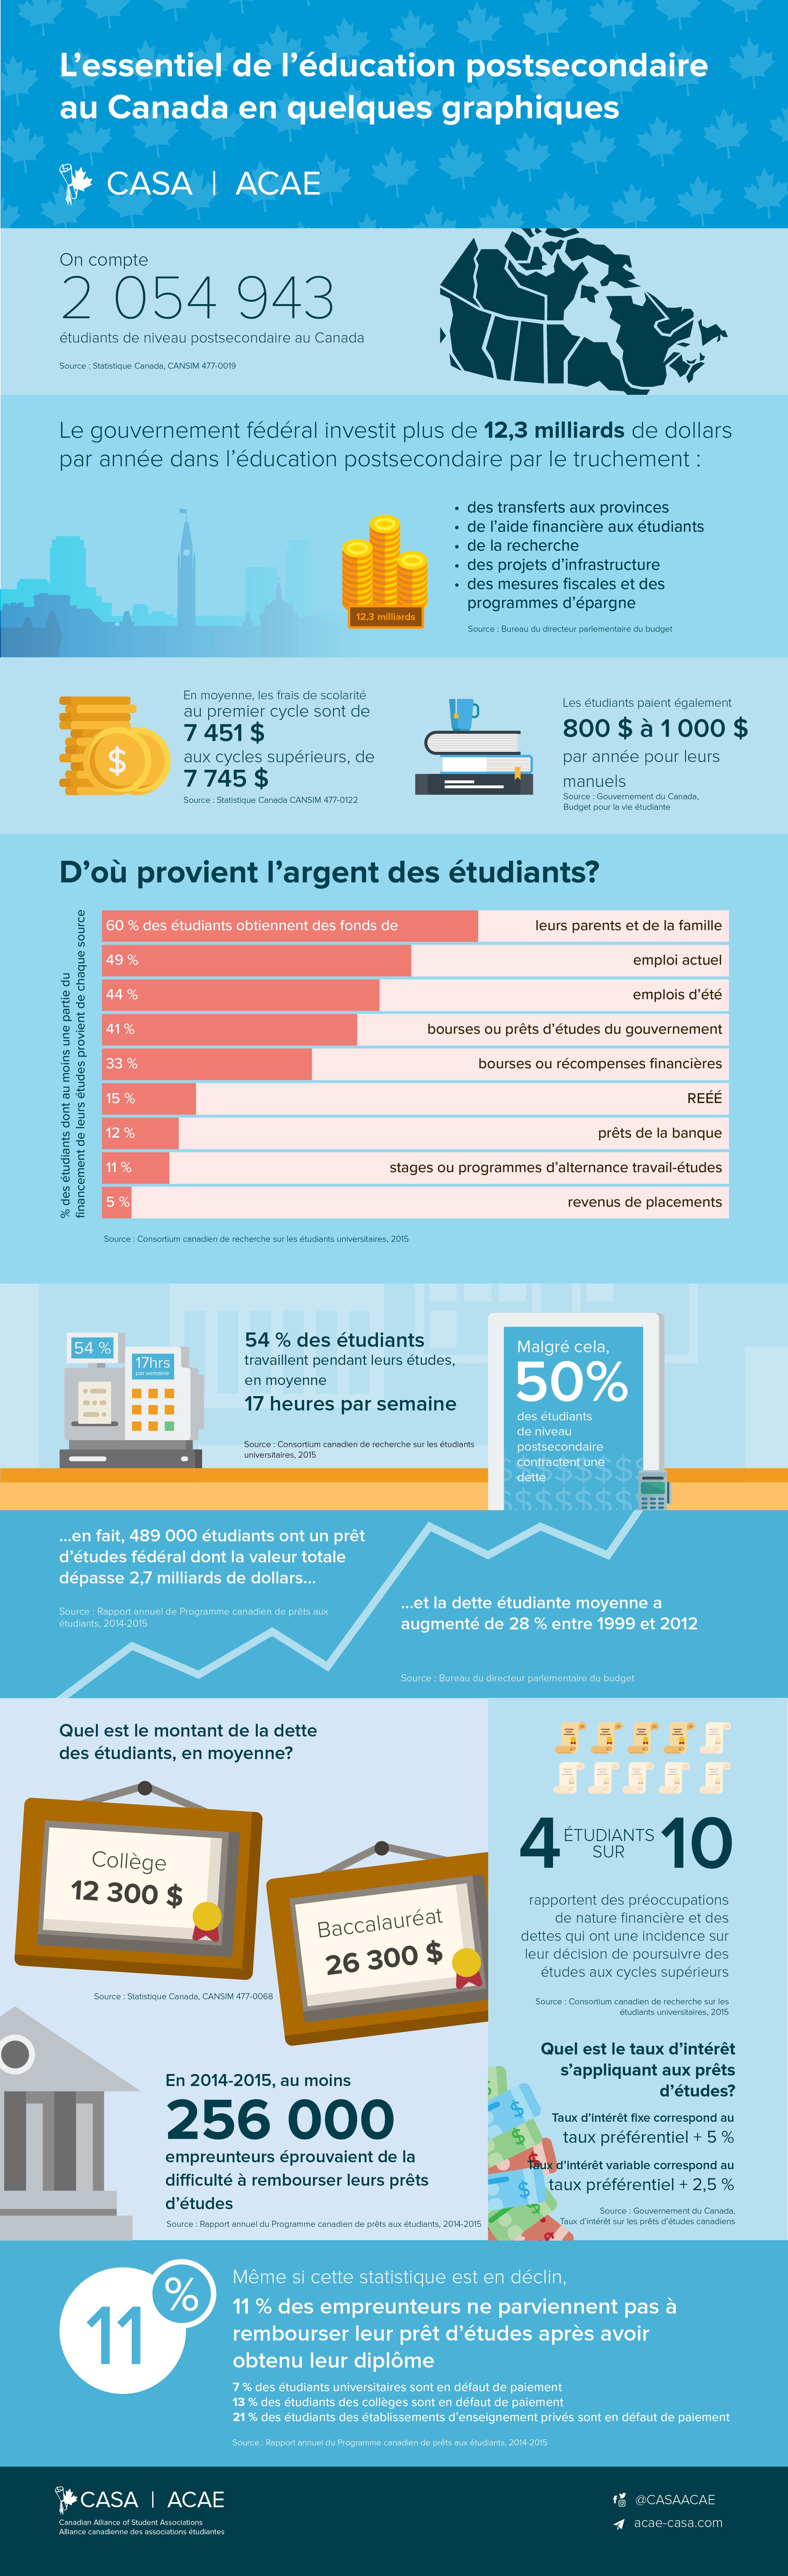 FR_Advocacy_Infographic_v_copy_2.png